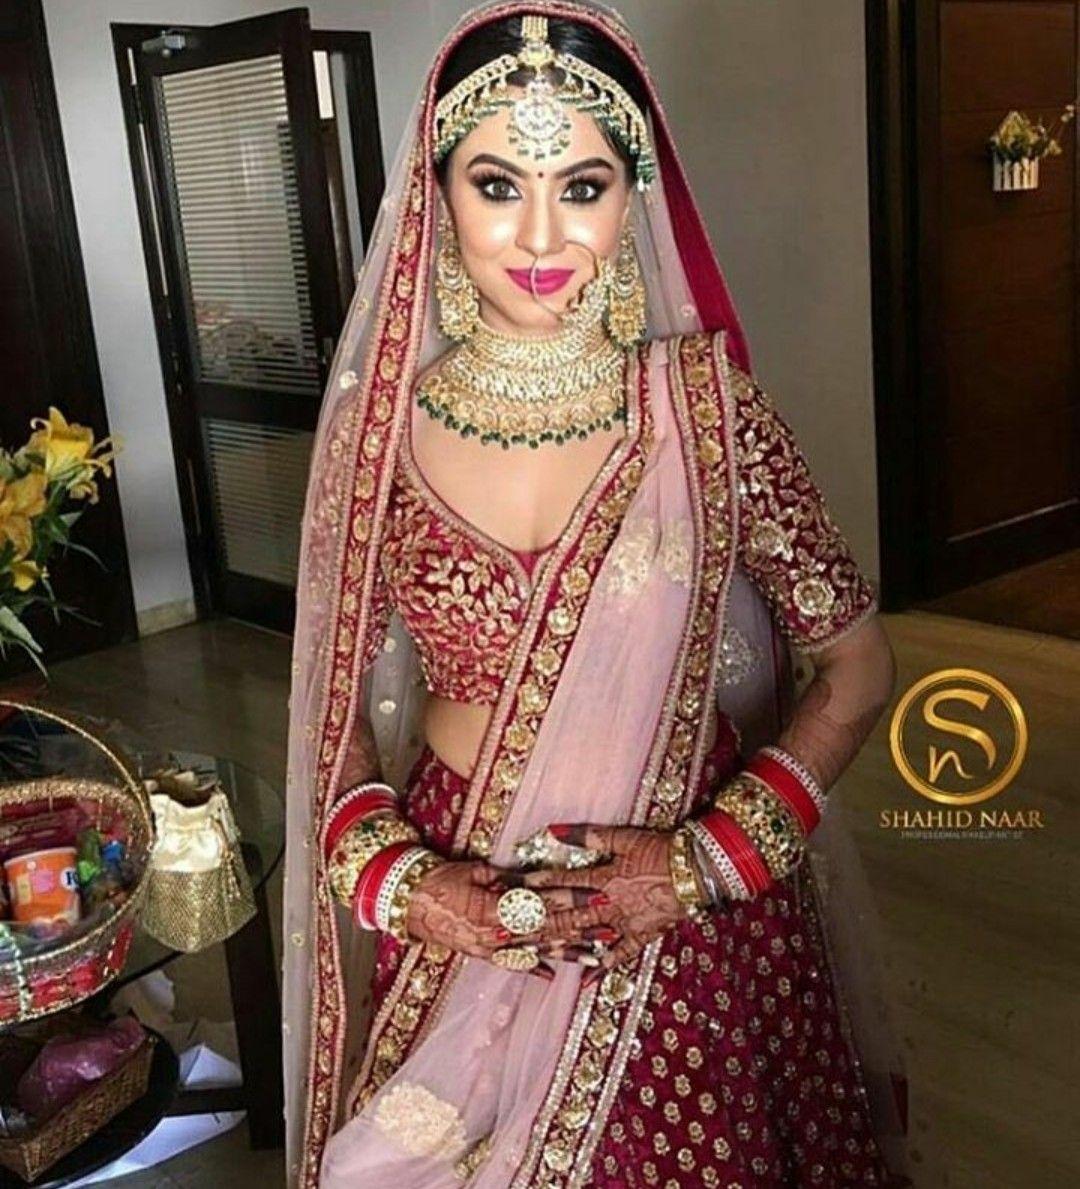 Hindu wedding dress  Pin by KrutiChevli on Indian Jewellery  Pinterest  Indian designer